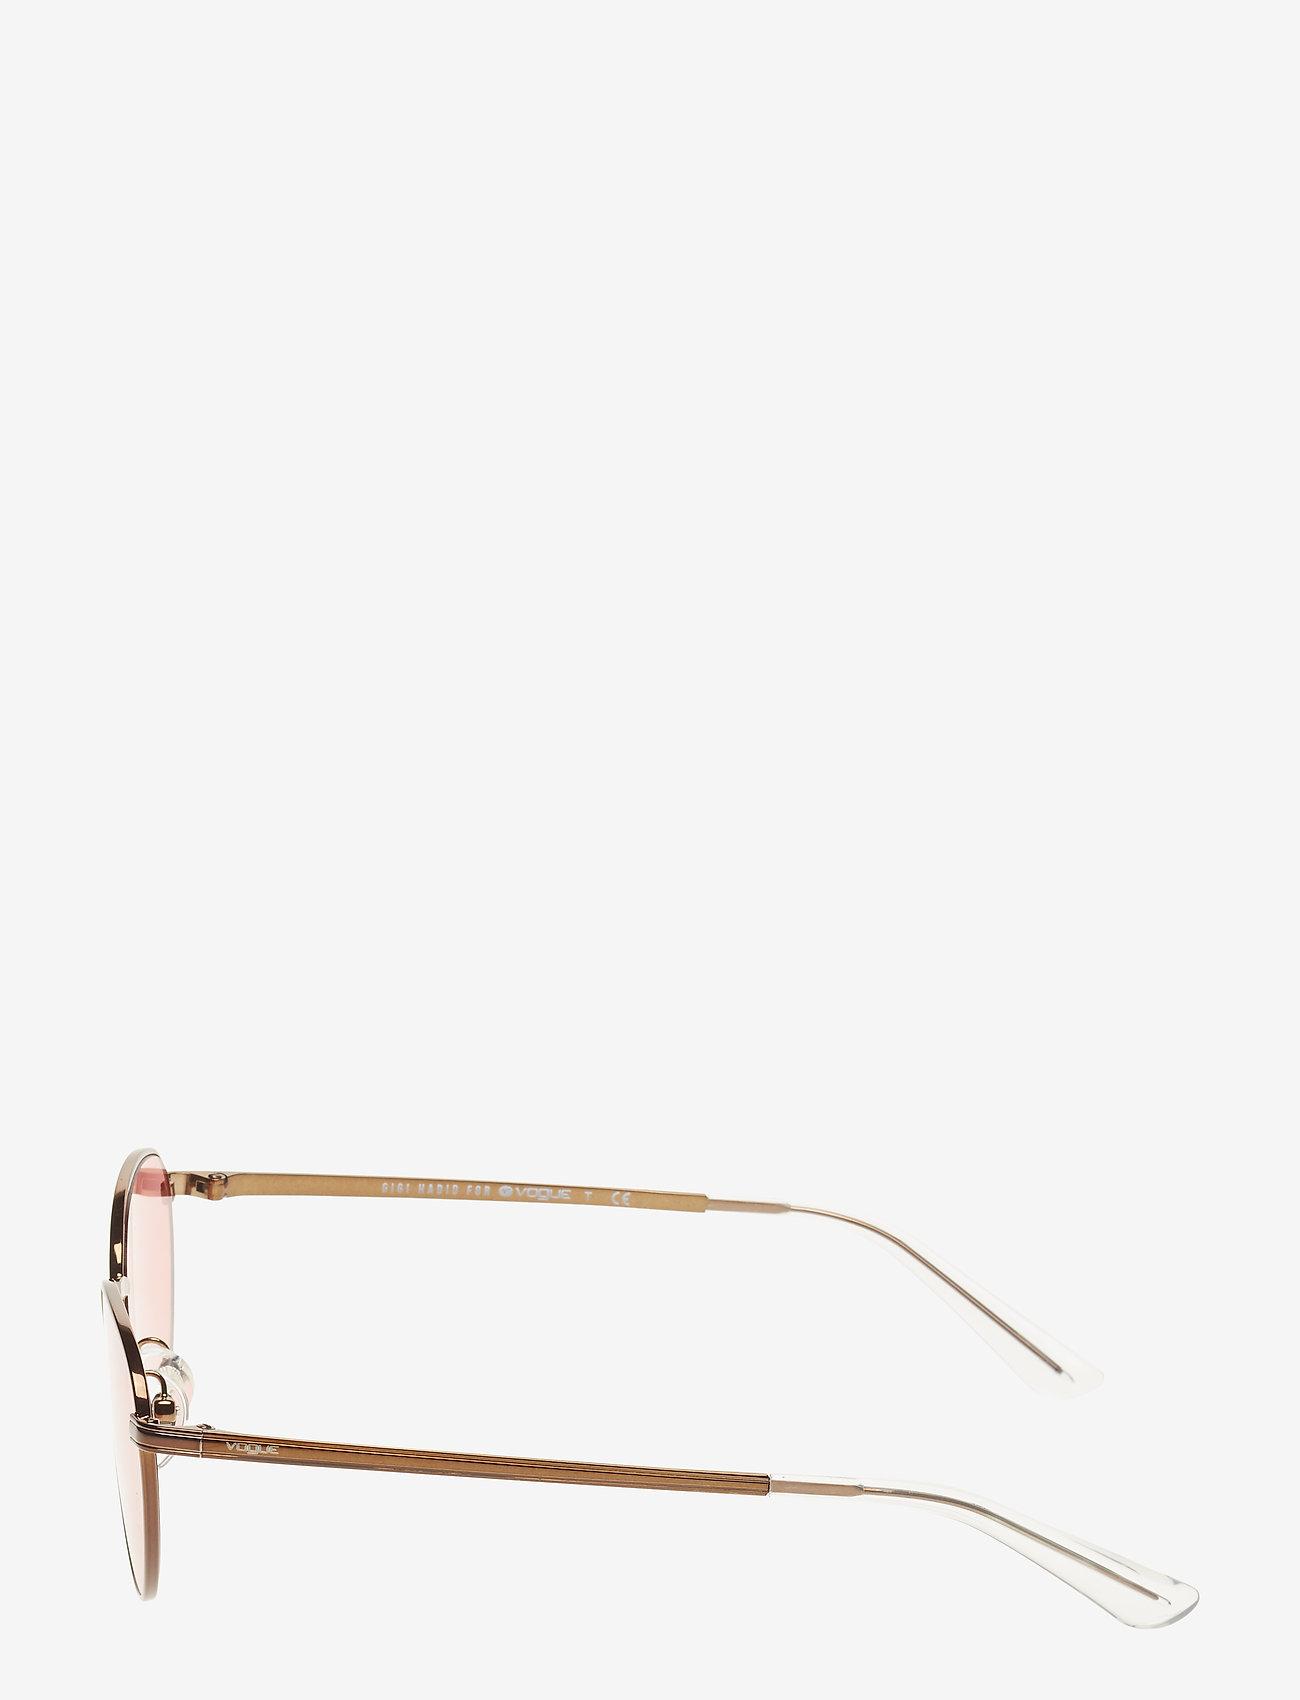 Vogue Eyewear - WOMEN'S SUNGLASSES - rond model - copper light brown/pink - 1